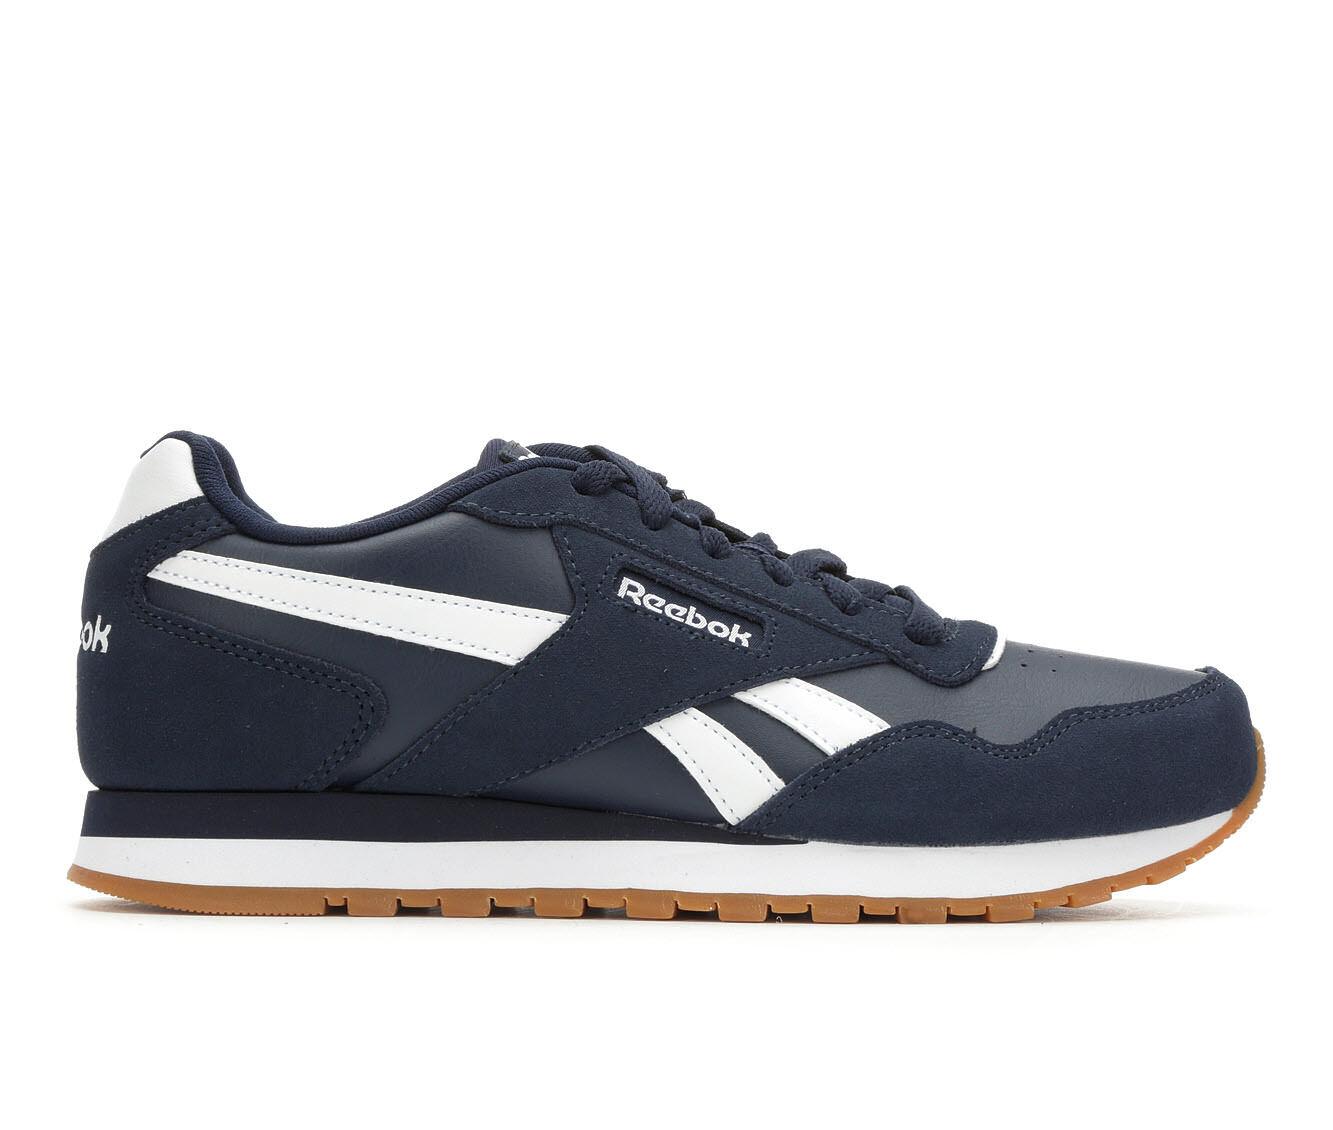 uk shoes_kd1841